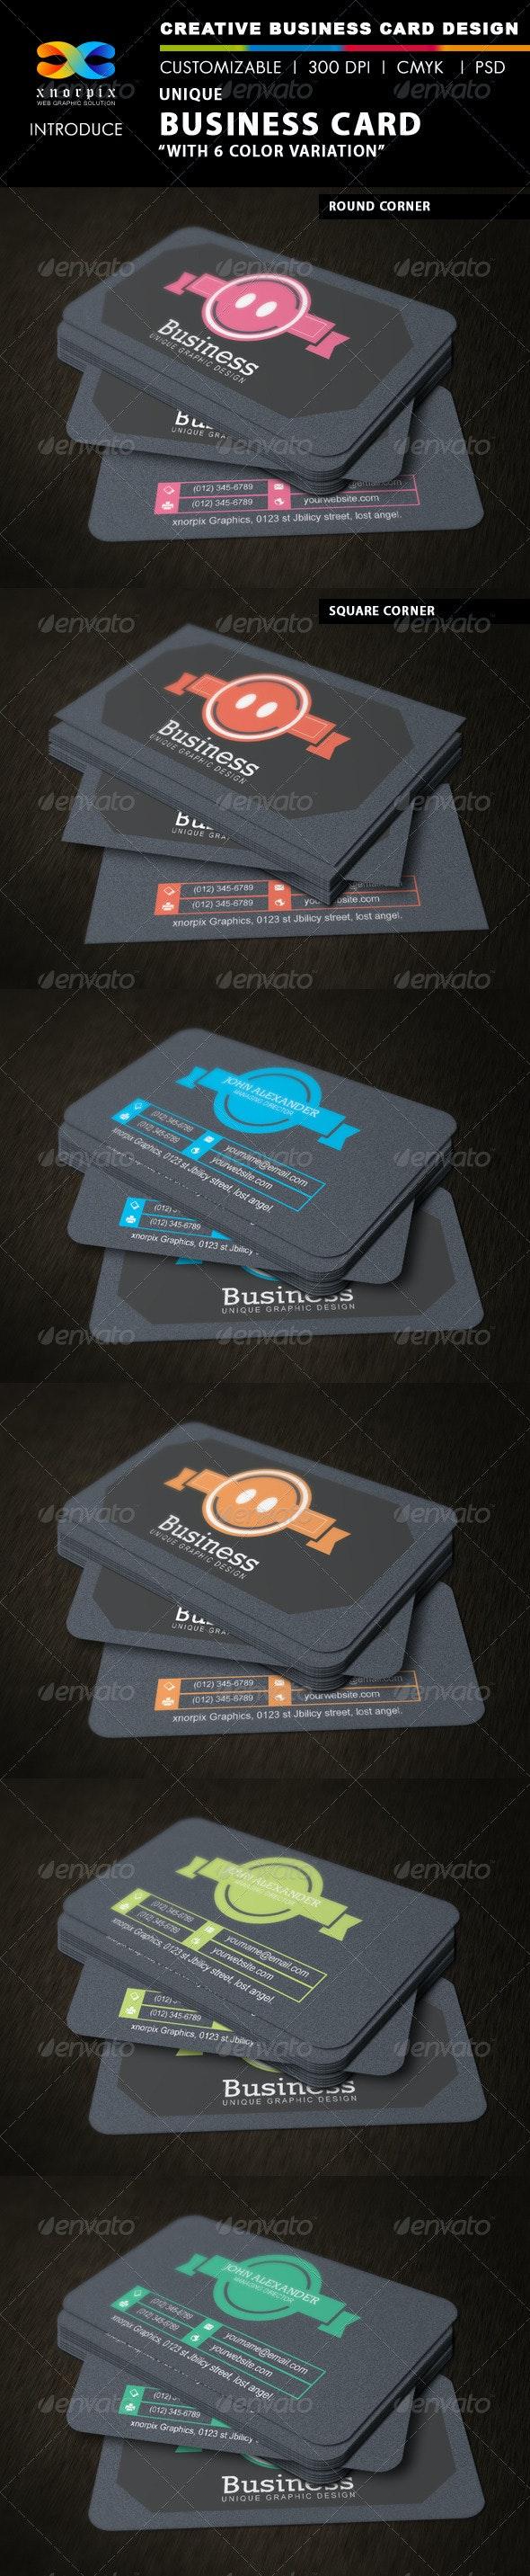 Unique Business Card - Creative Business Cards